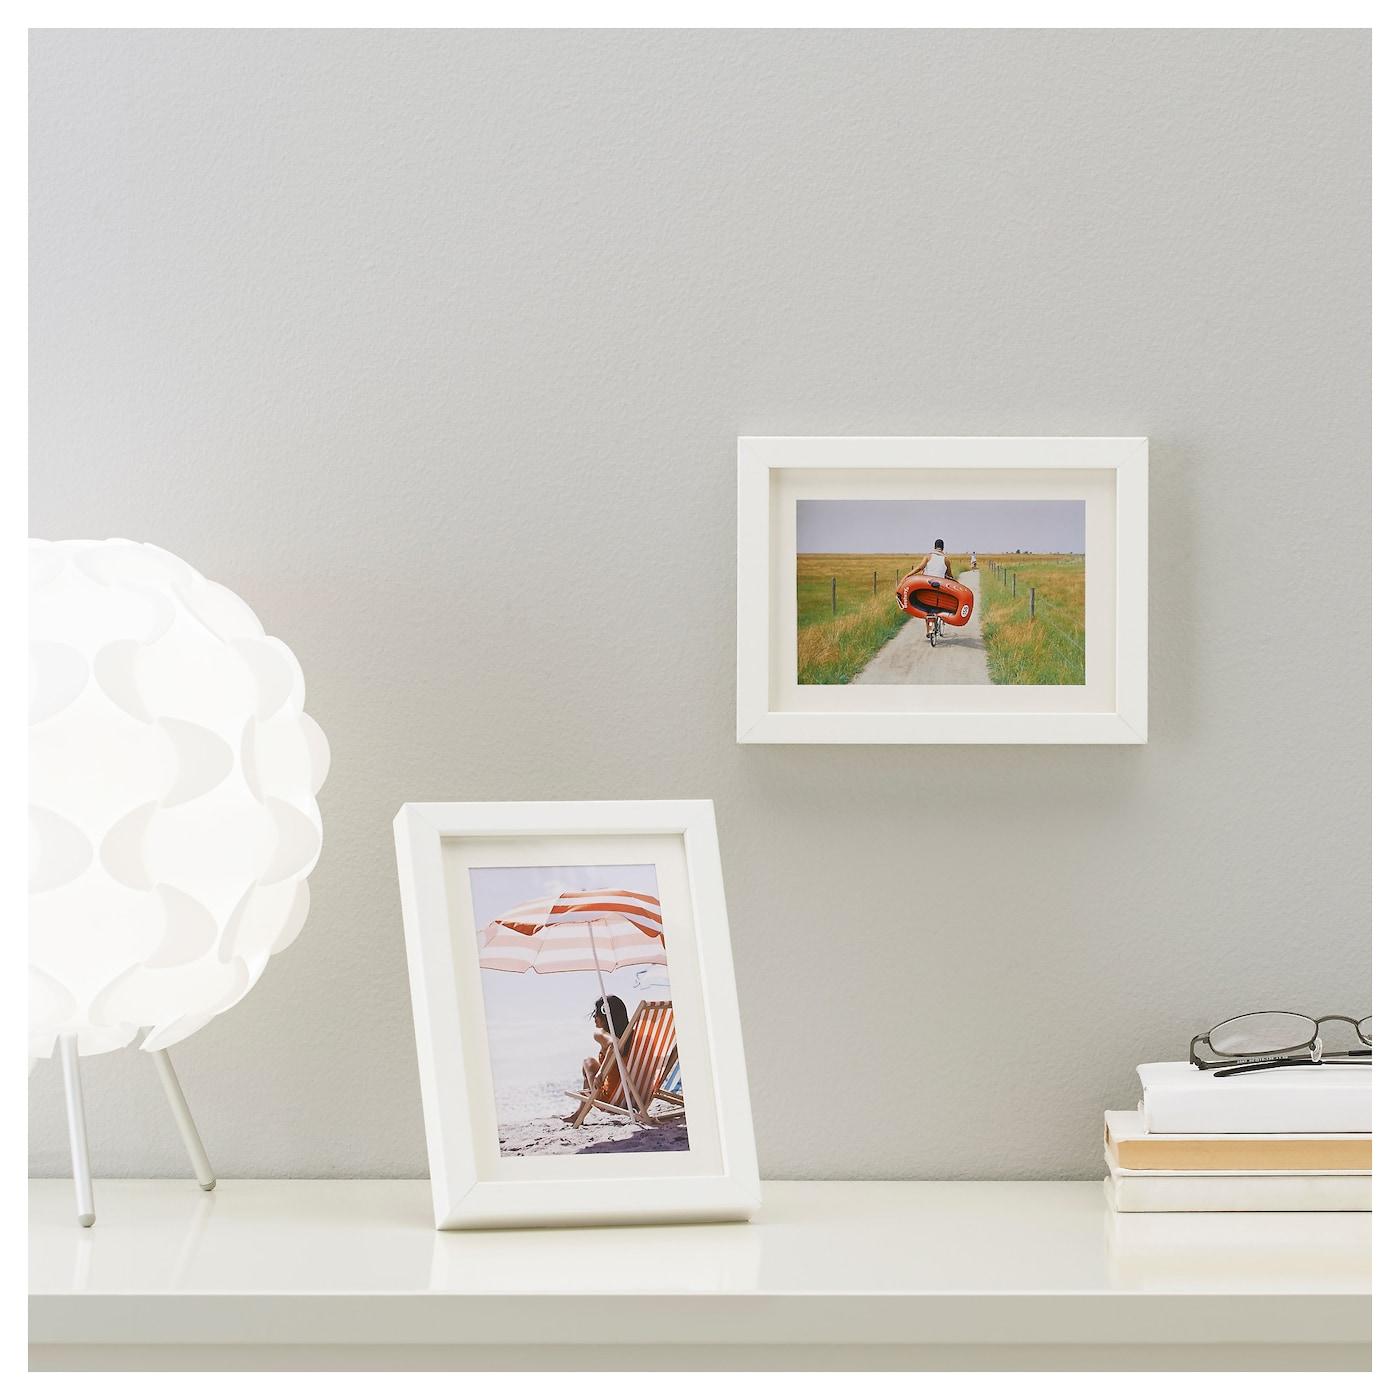 limhall cadre blanc 13x18 cm ikea. Black Bedroom Furniture Sets. Home Design Ideas